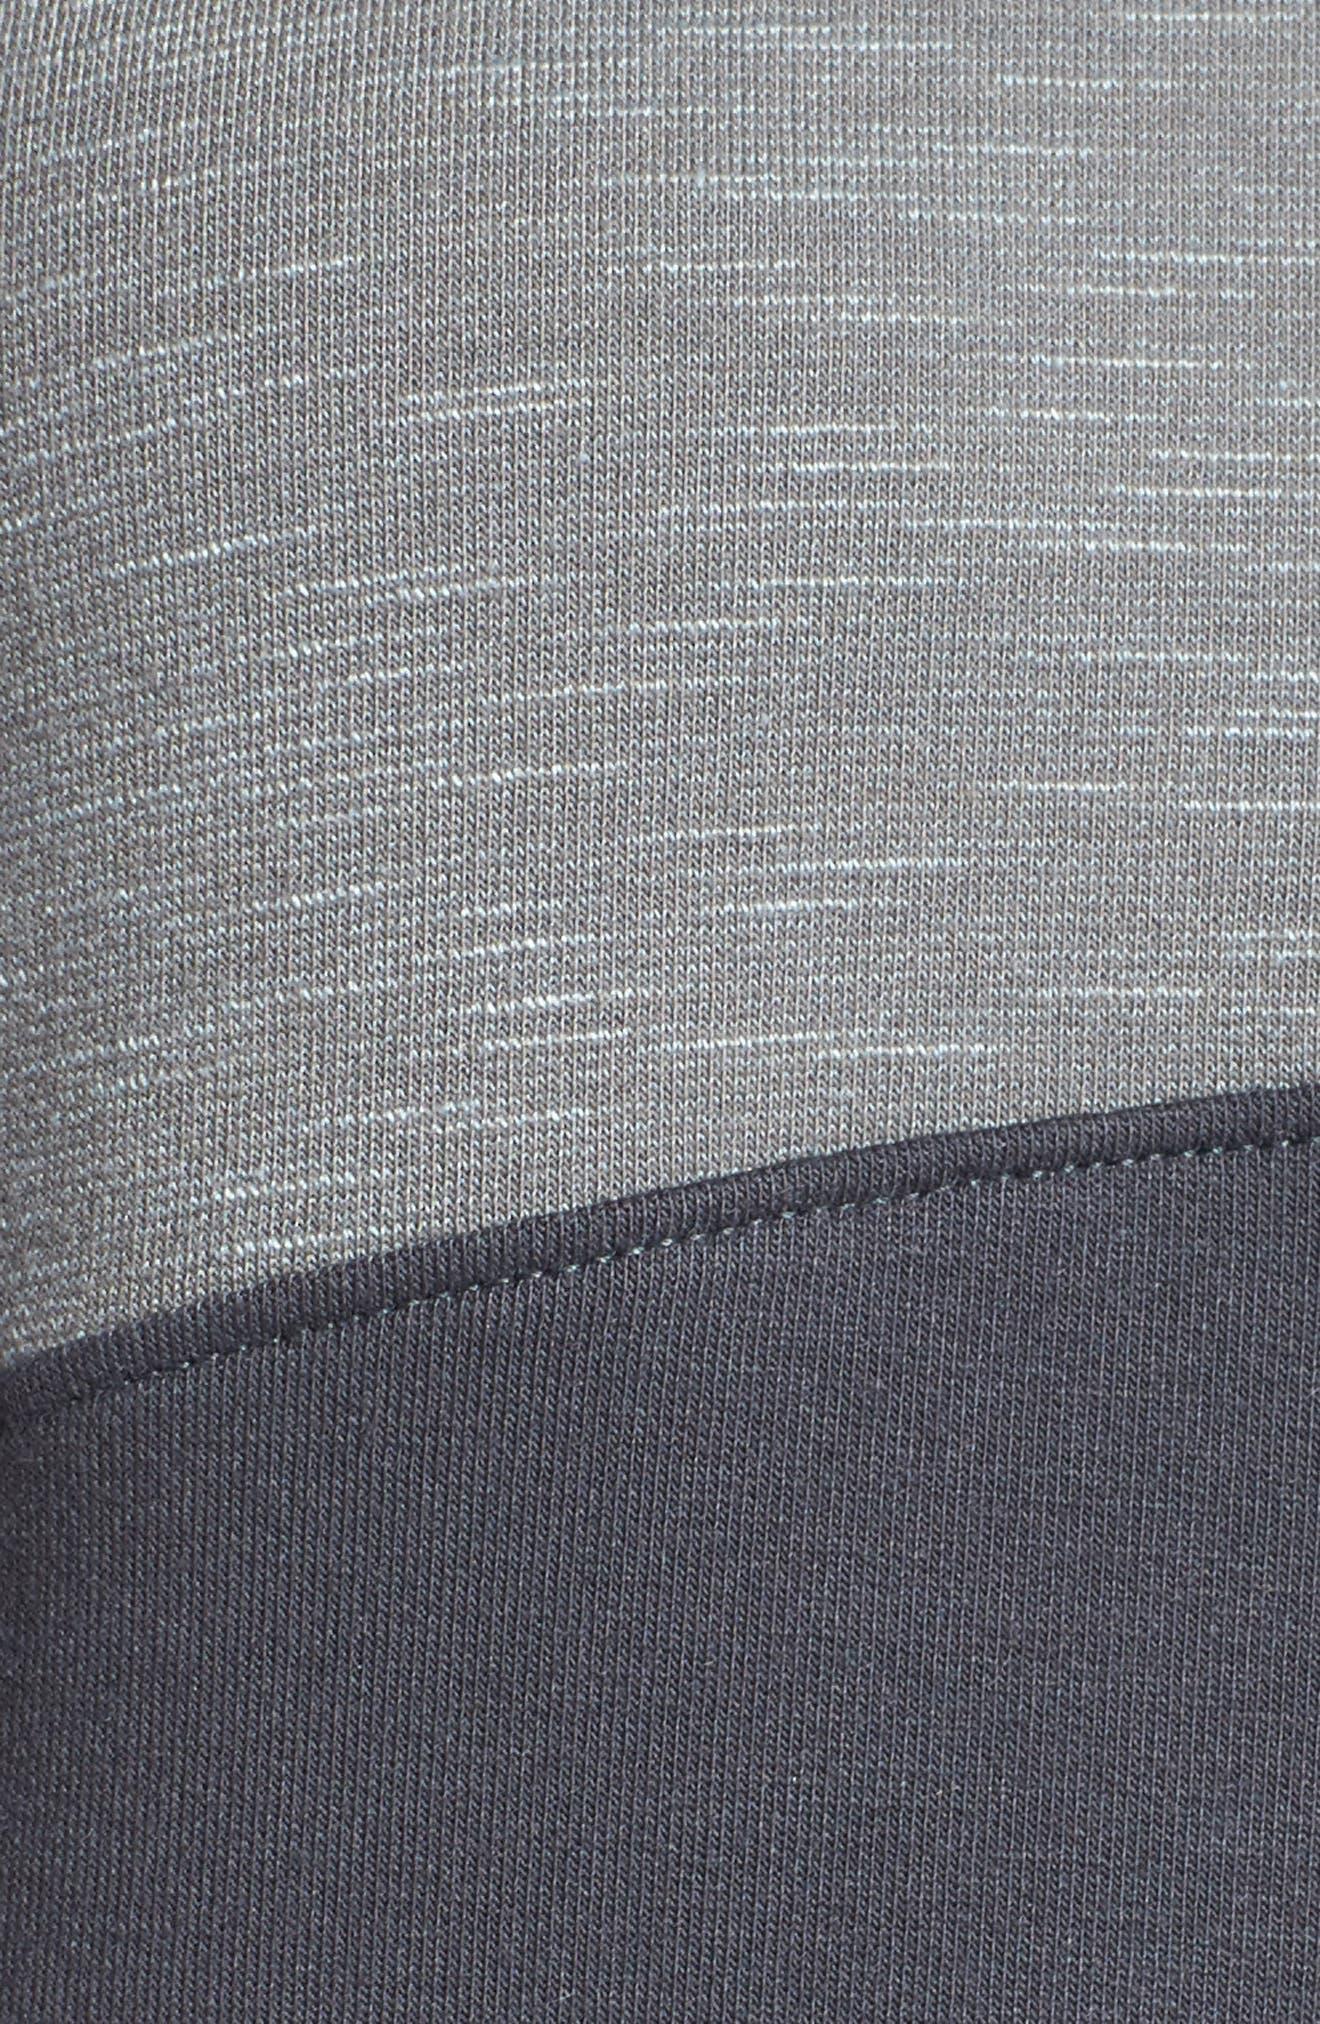 Threadborne Pullover,                             Alternate thumbnail 6, color,